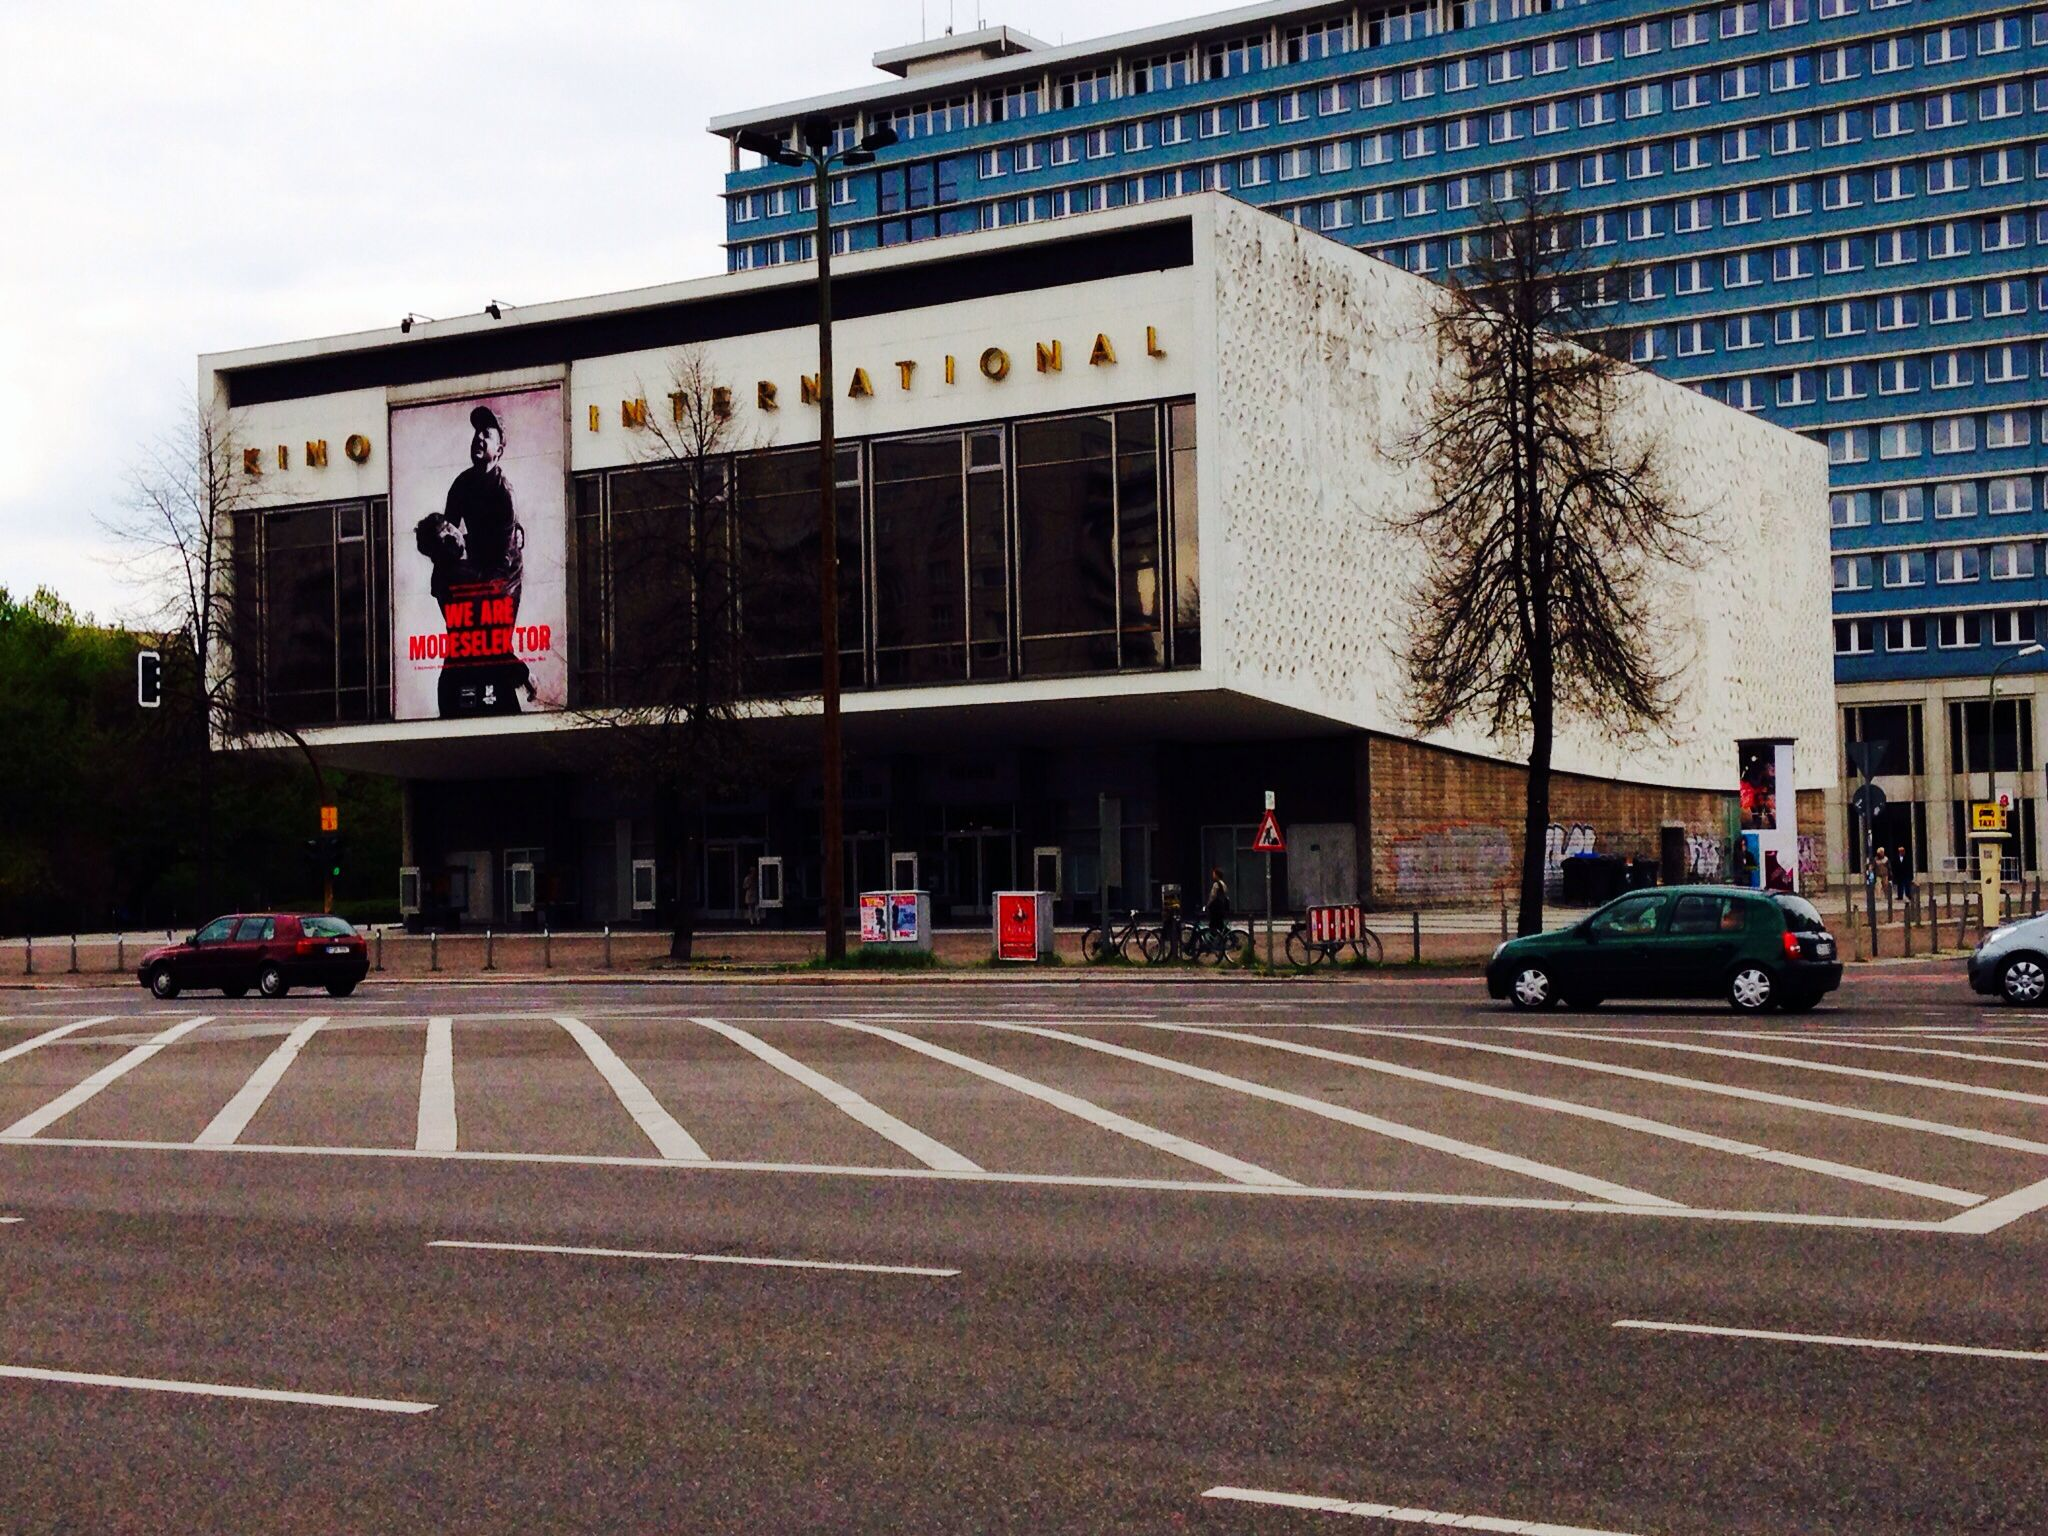 TLG IMMOBILIEN: Kino Cubix, Berlin